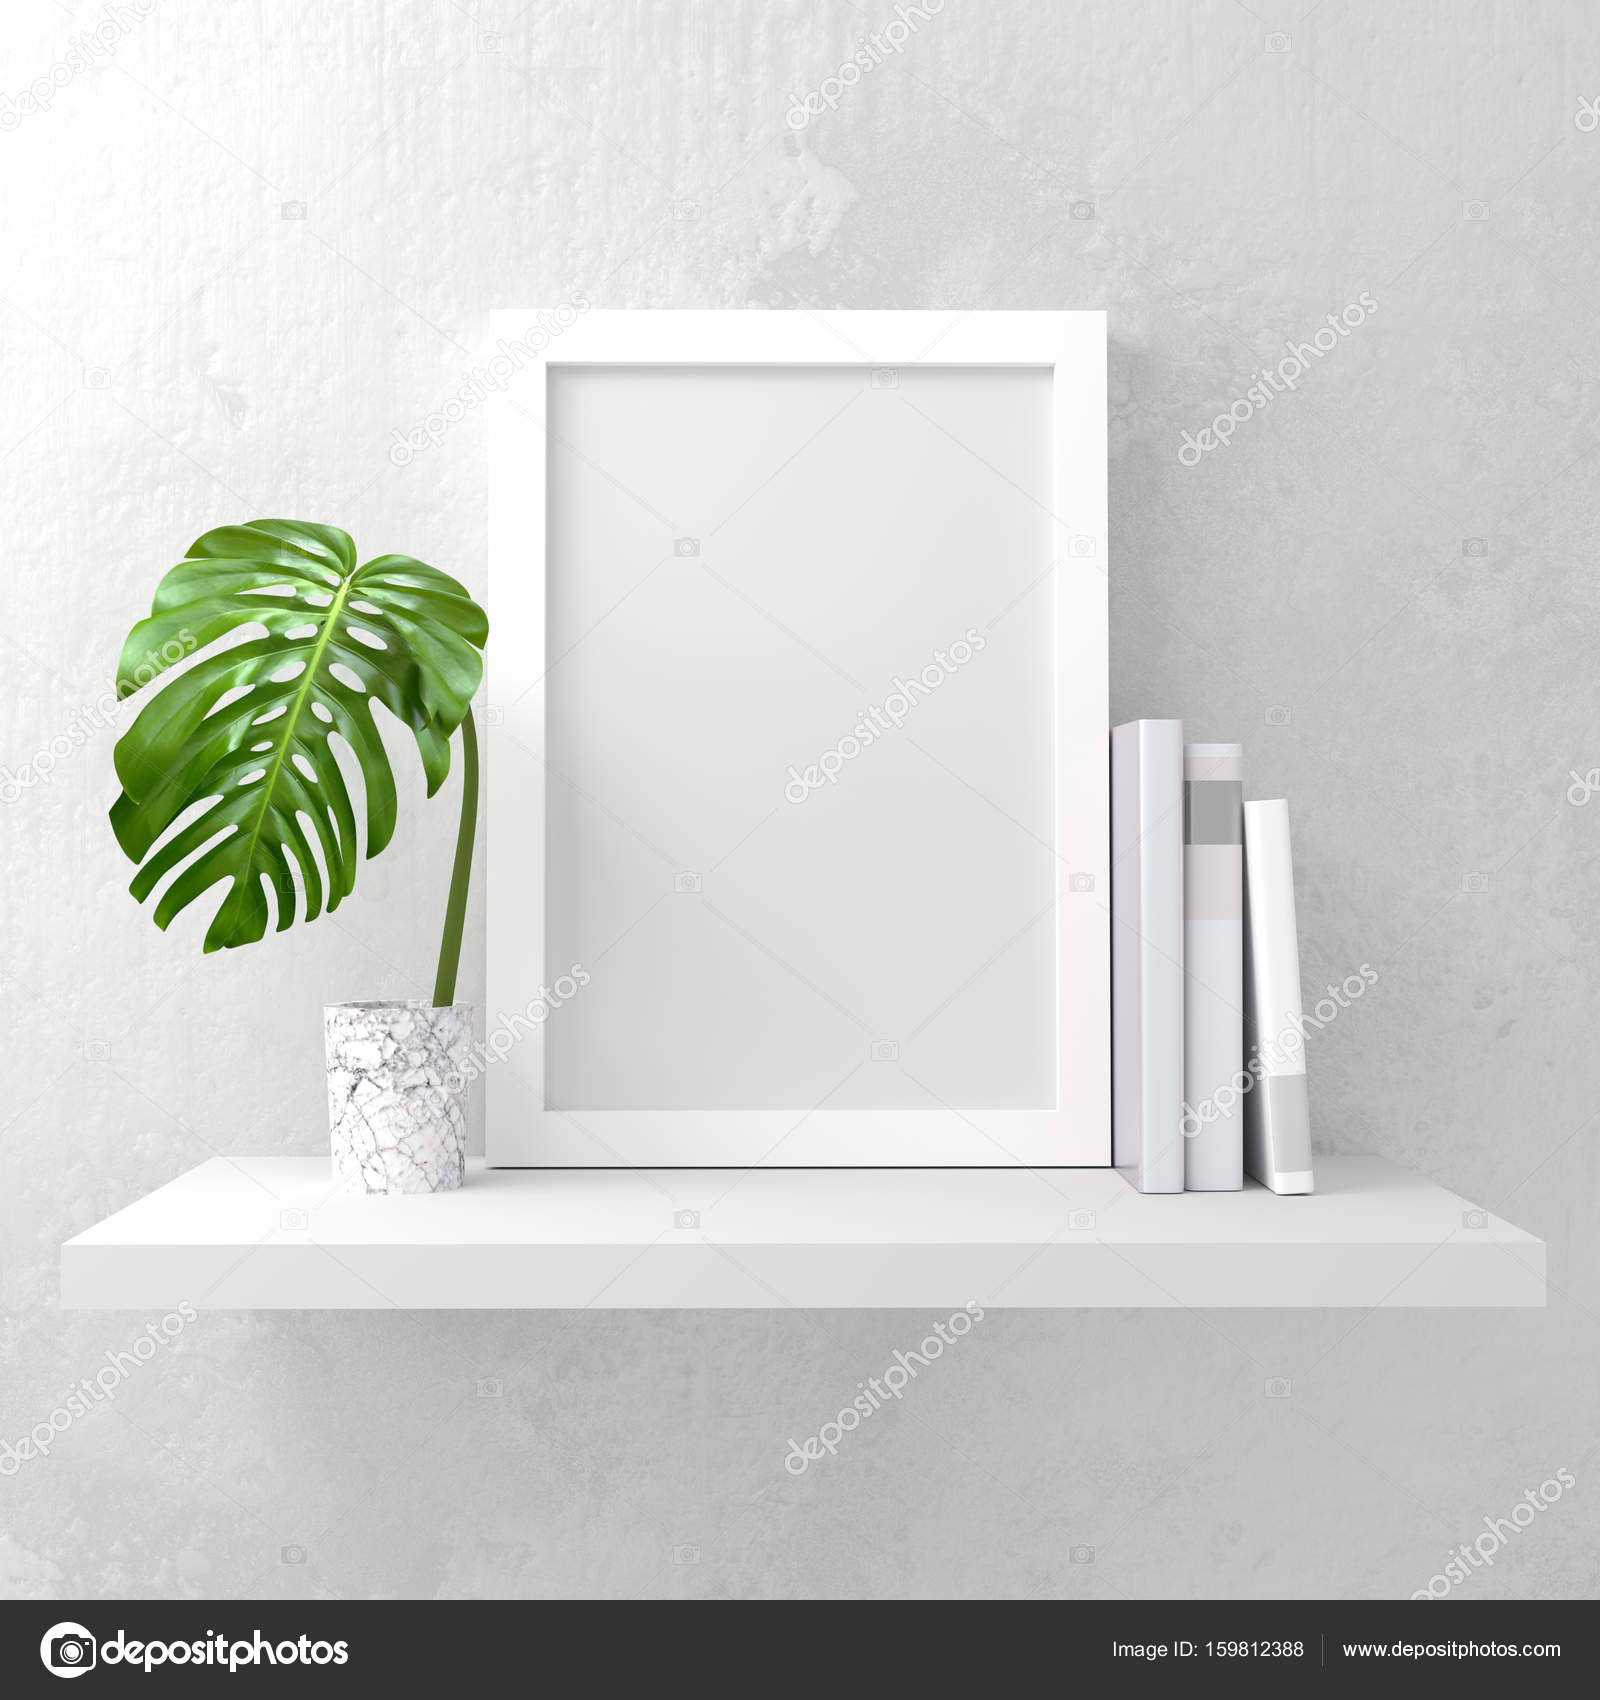 Foto Rahmen Mock-Up Hintergrund — Stockfoto © solarseven #159812388